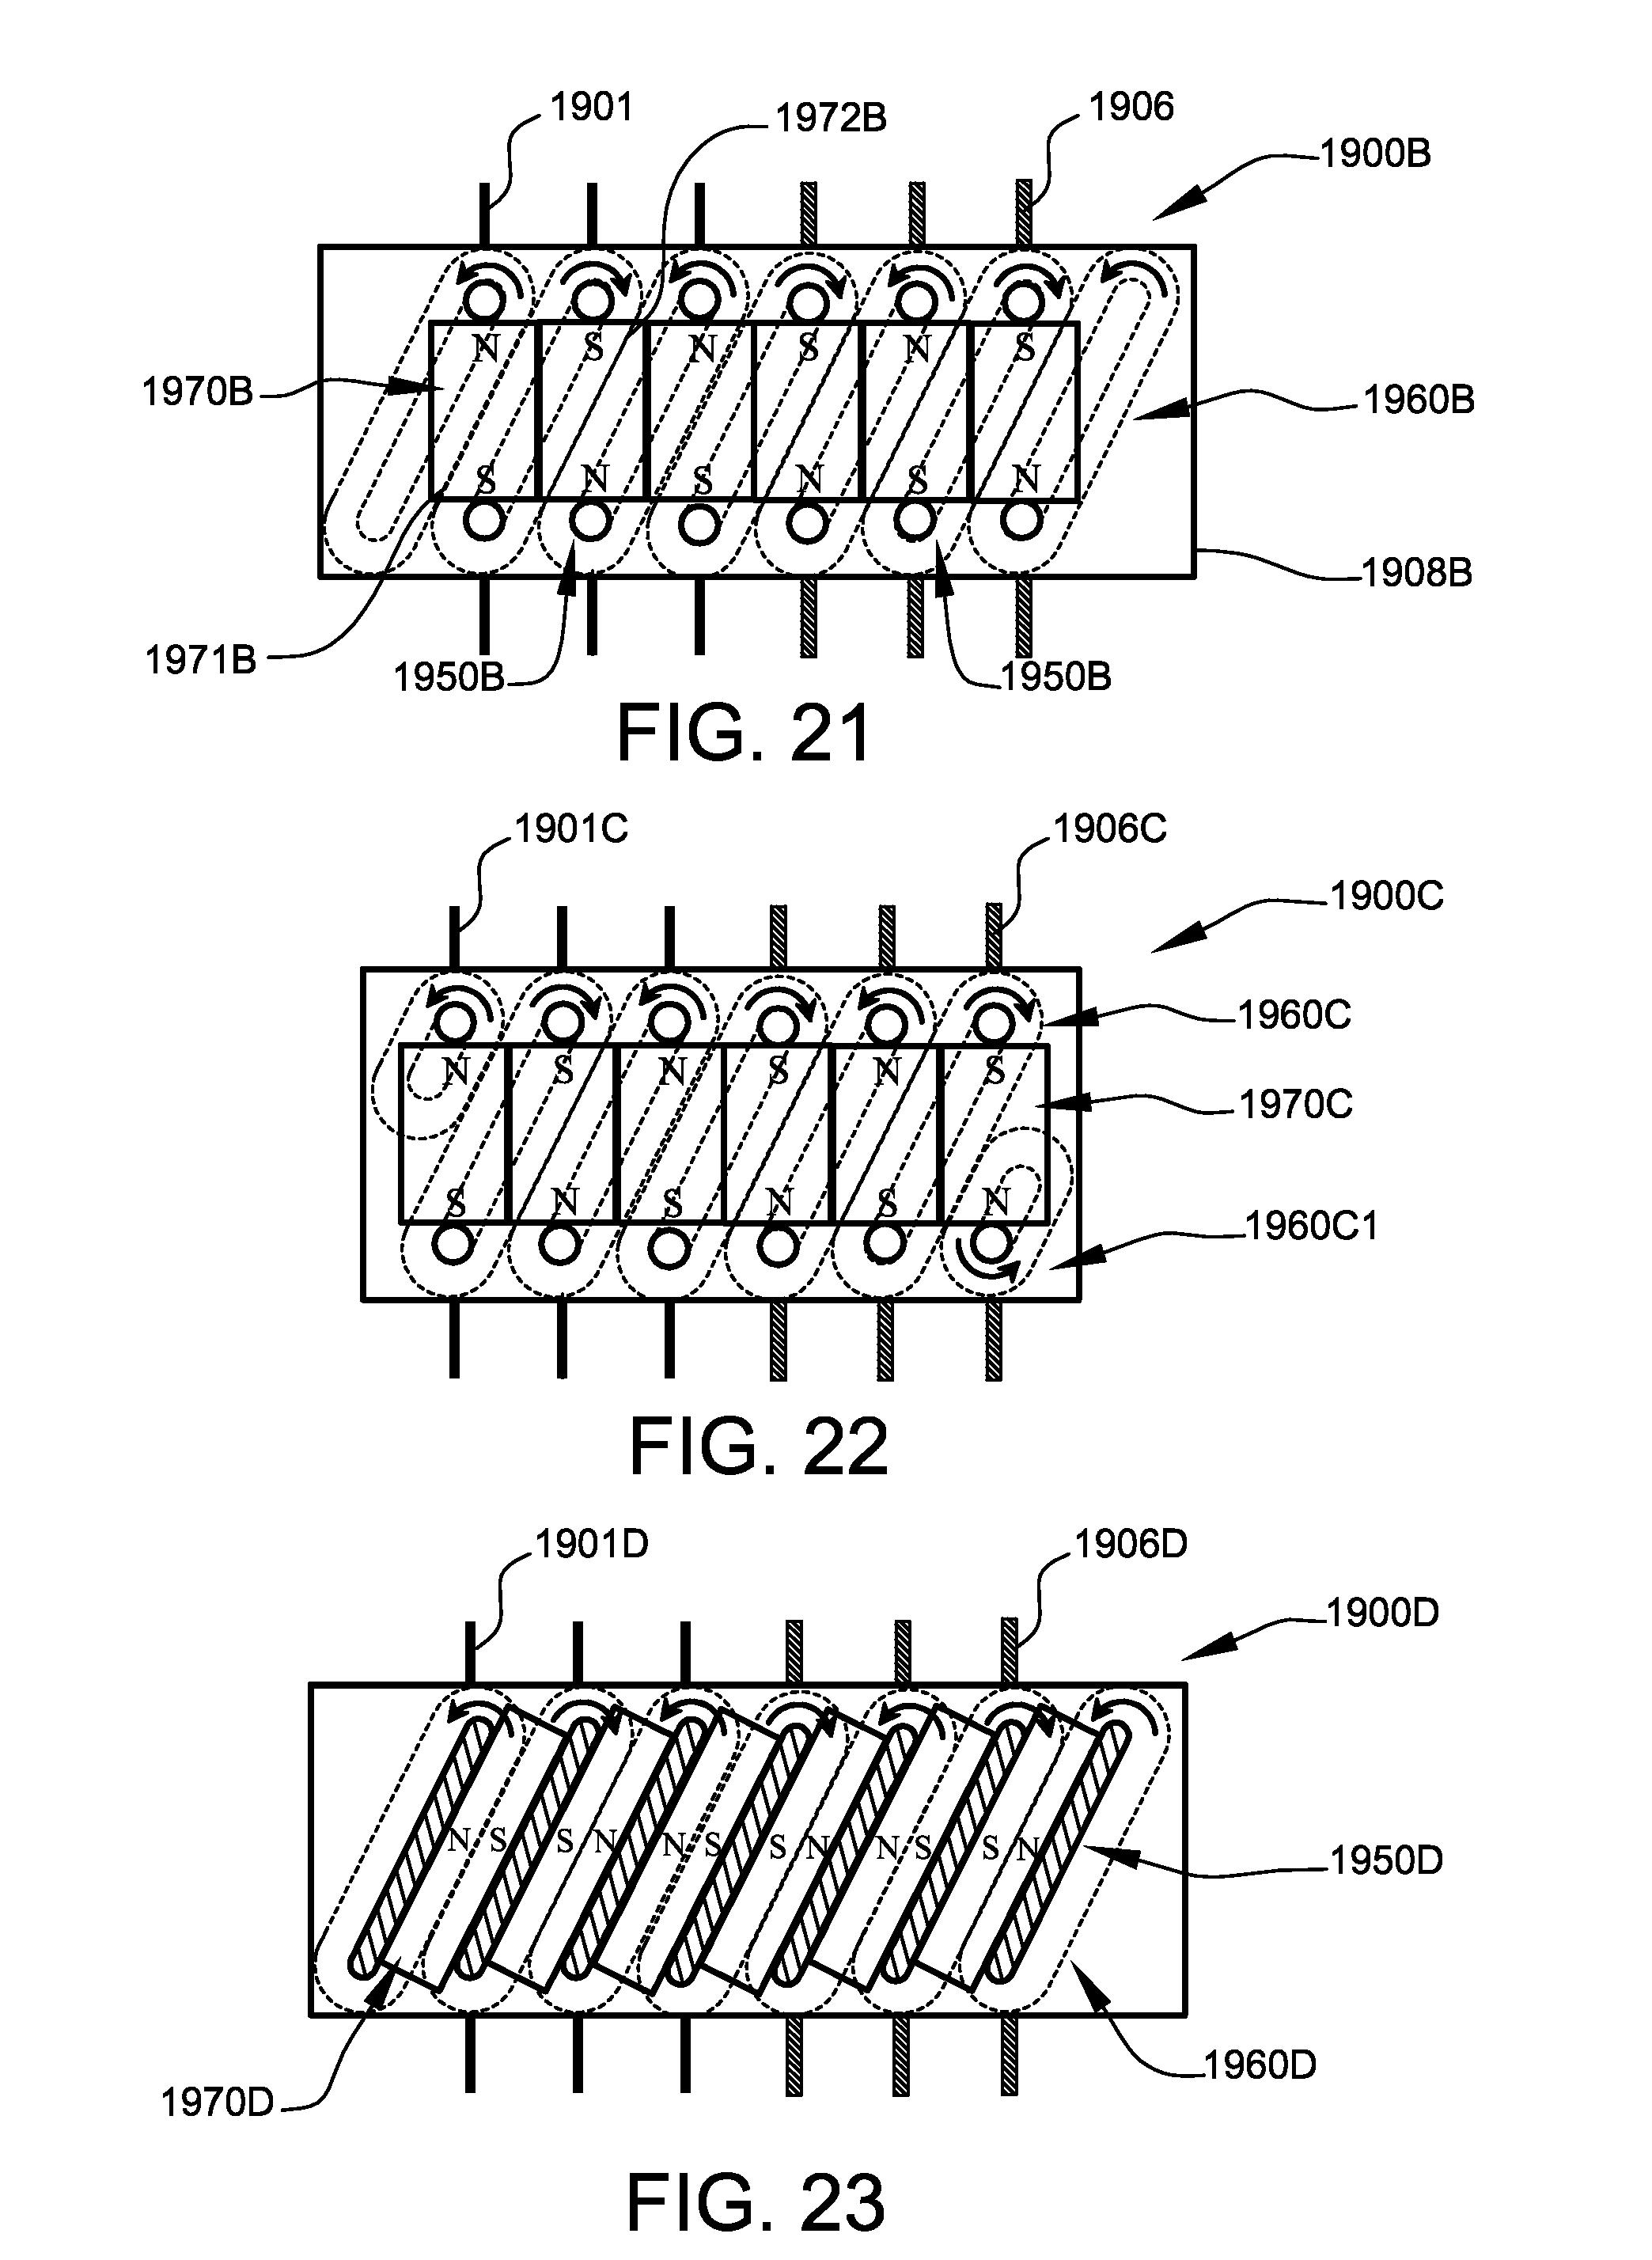 1989 jeep wrangler wiring diagram mr 8617  jeep cherokee vacuum line diagram on 88 jeep cherokee  jeep cherokee vacuum line diagram on 88